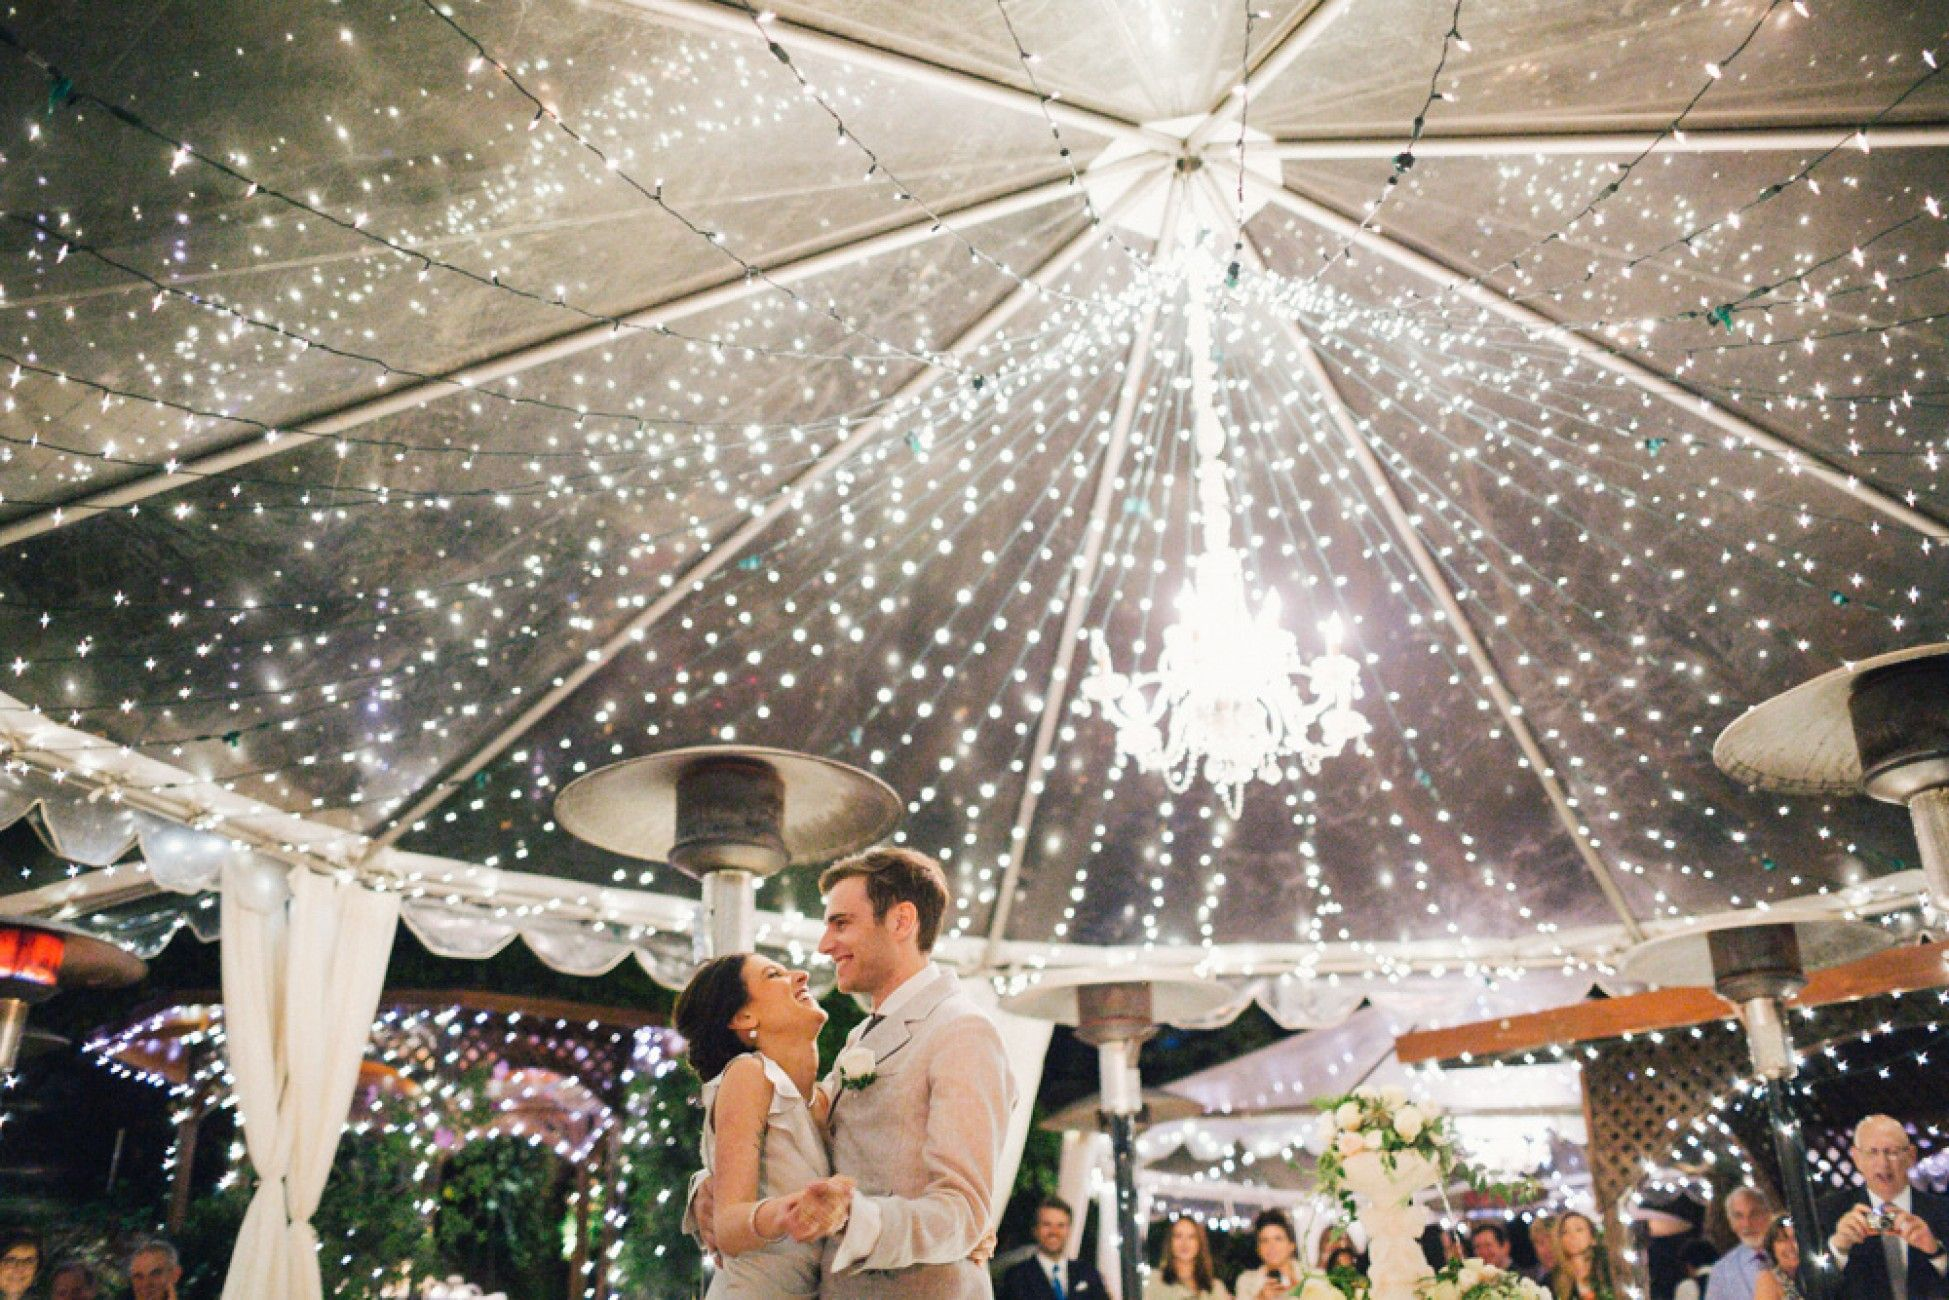 Amanda peters inn of the seventh ray wedding sweet